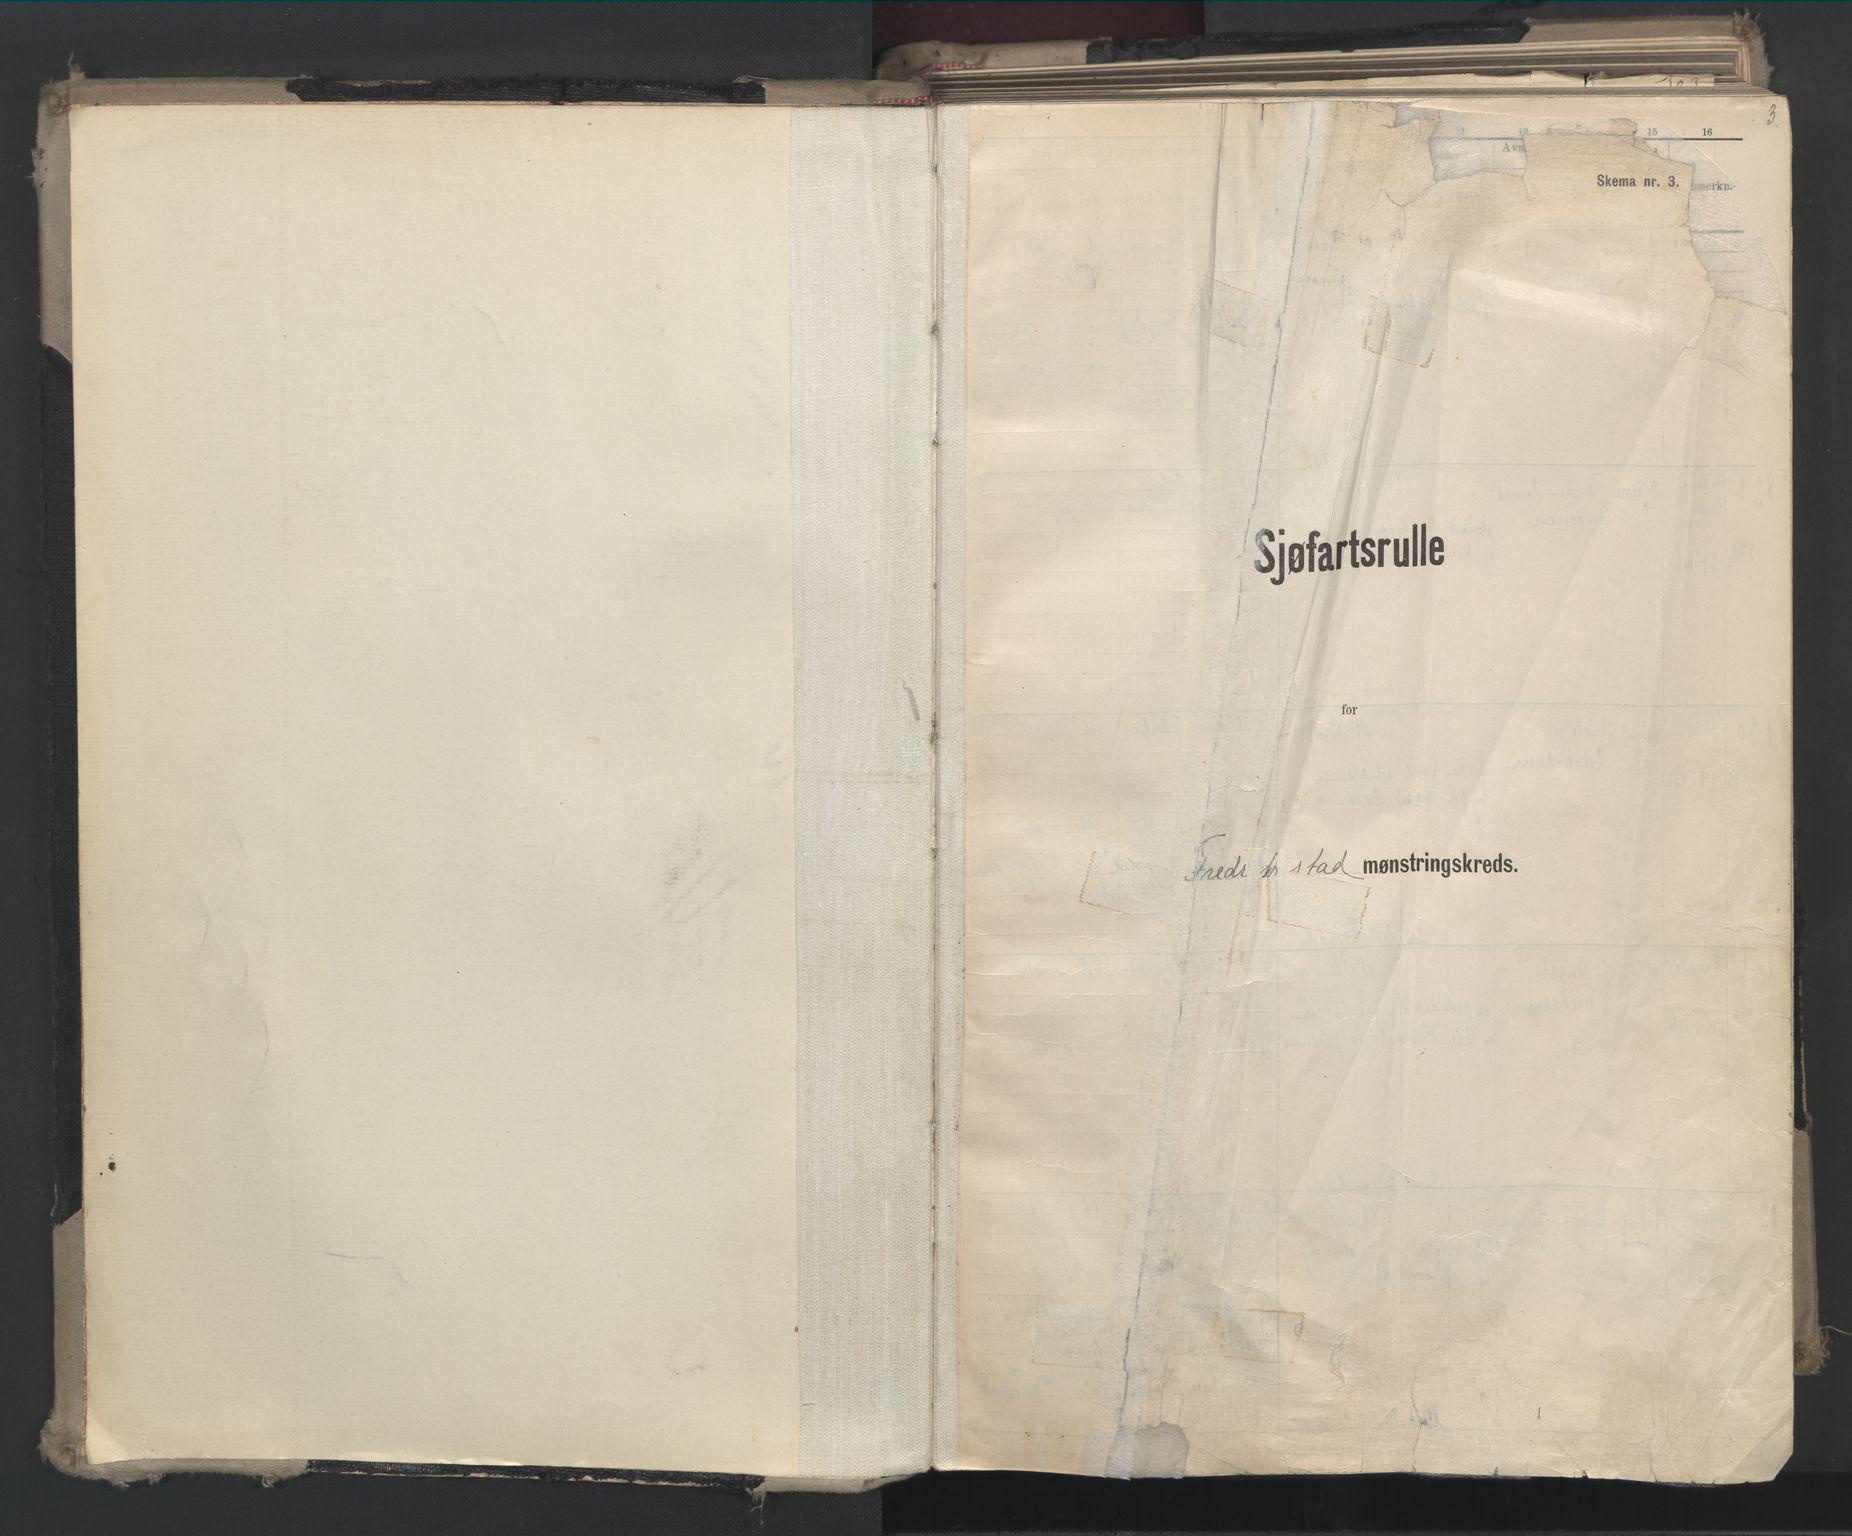 SAO, Oslo sjømannskontor, F/Fd/L0008: B-rulle, 1914, s. 1